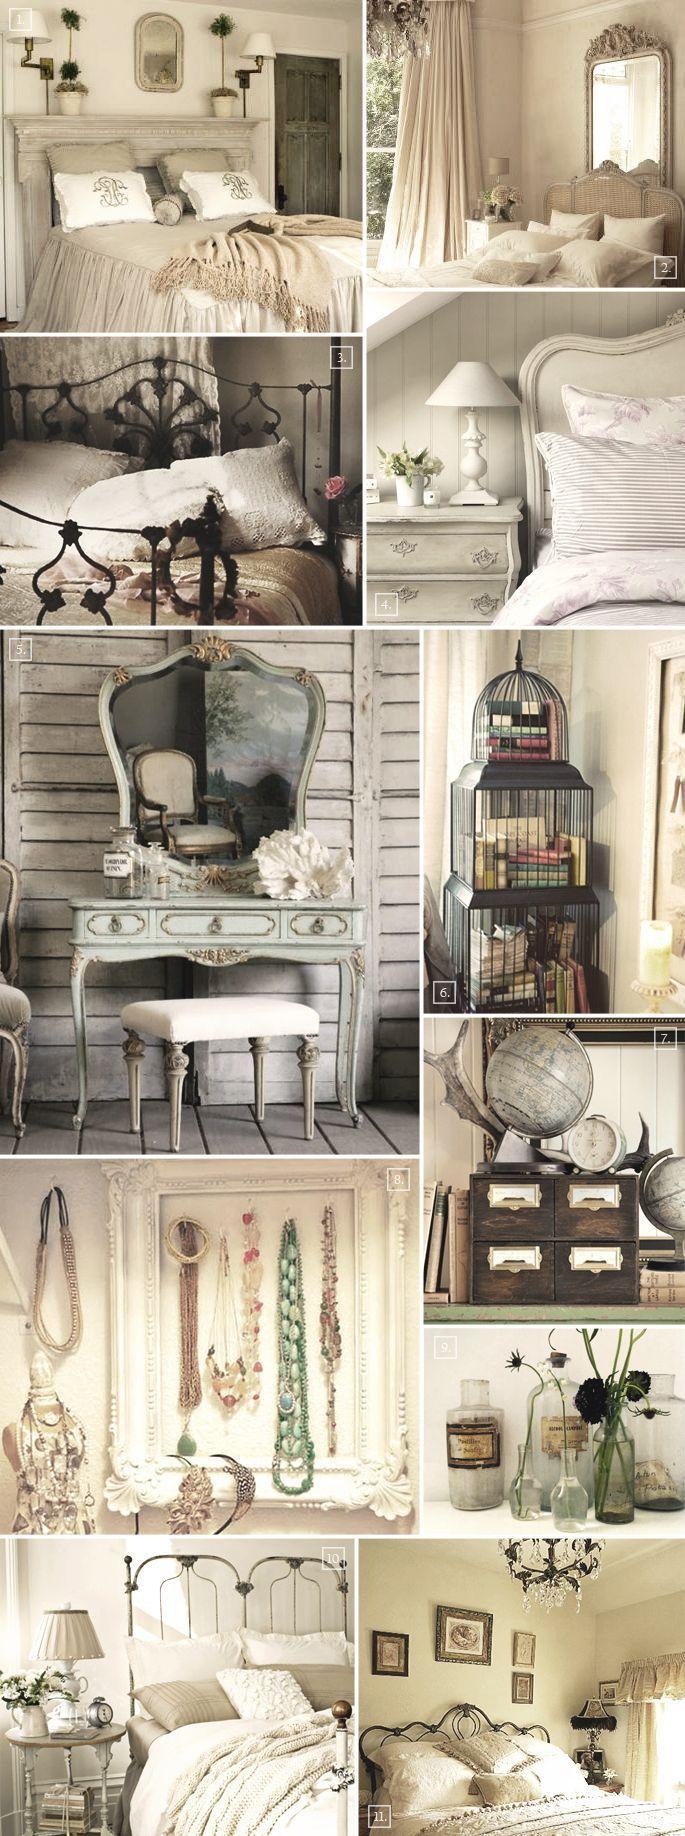 Vintage Bedroom Decor Accessories and Ideas | Home Tree Atlas. Very pretty ideas